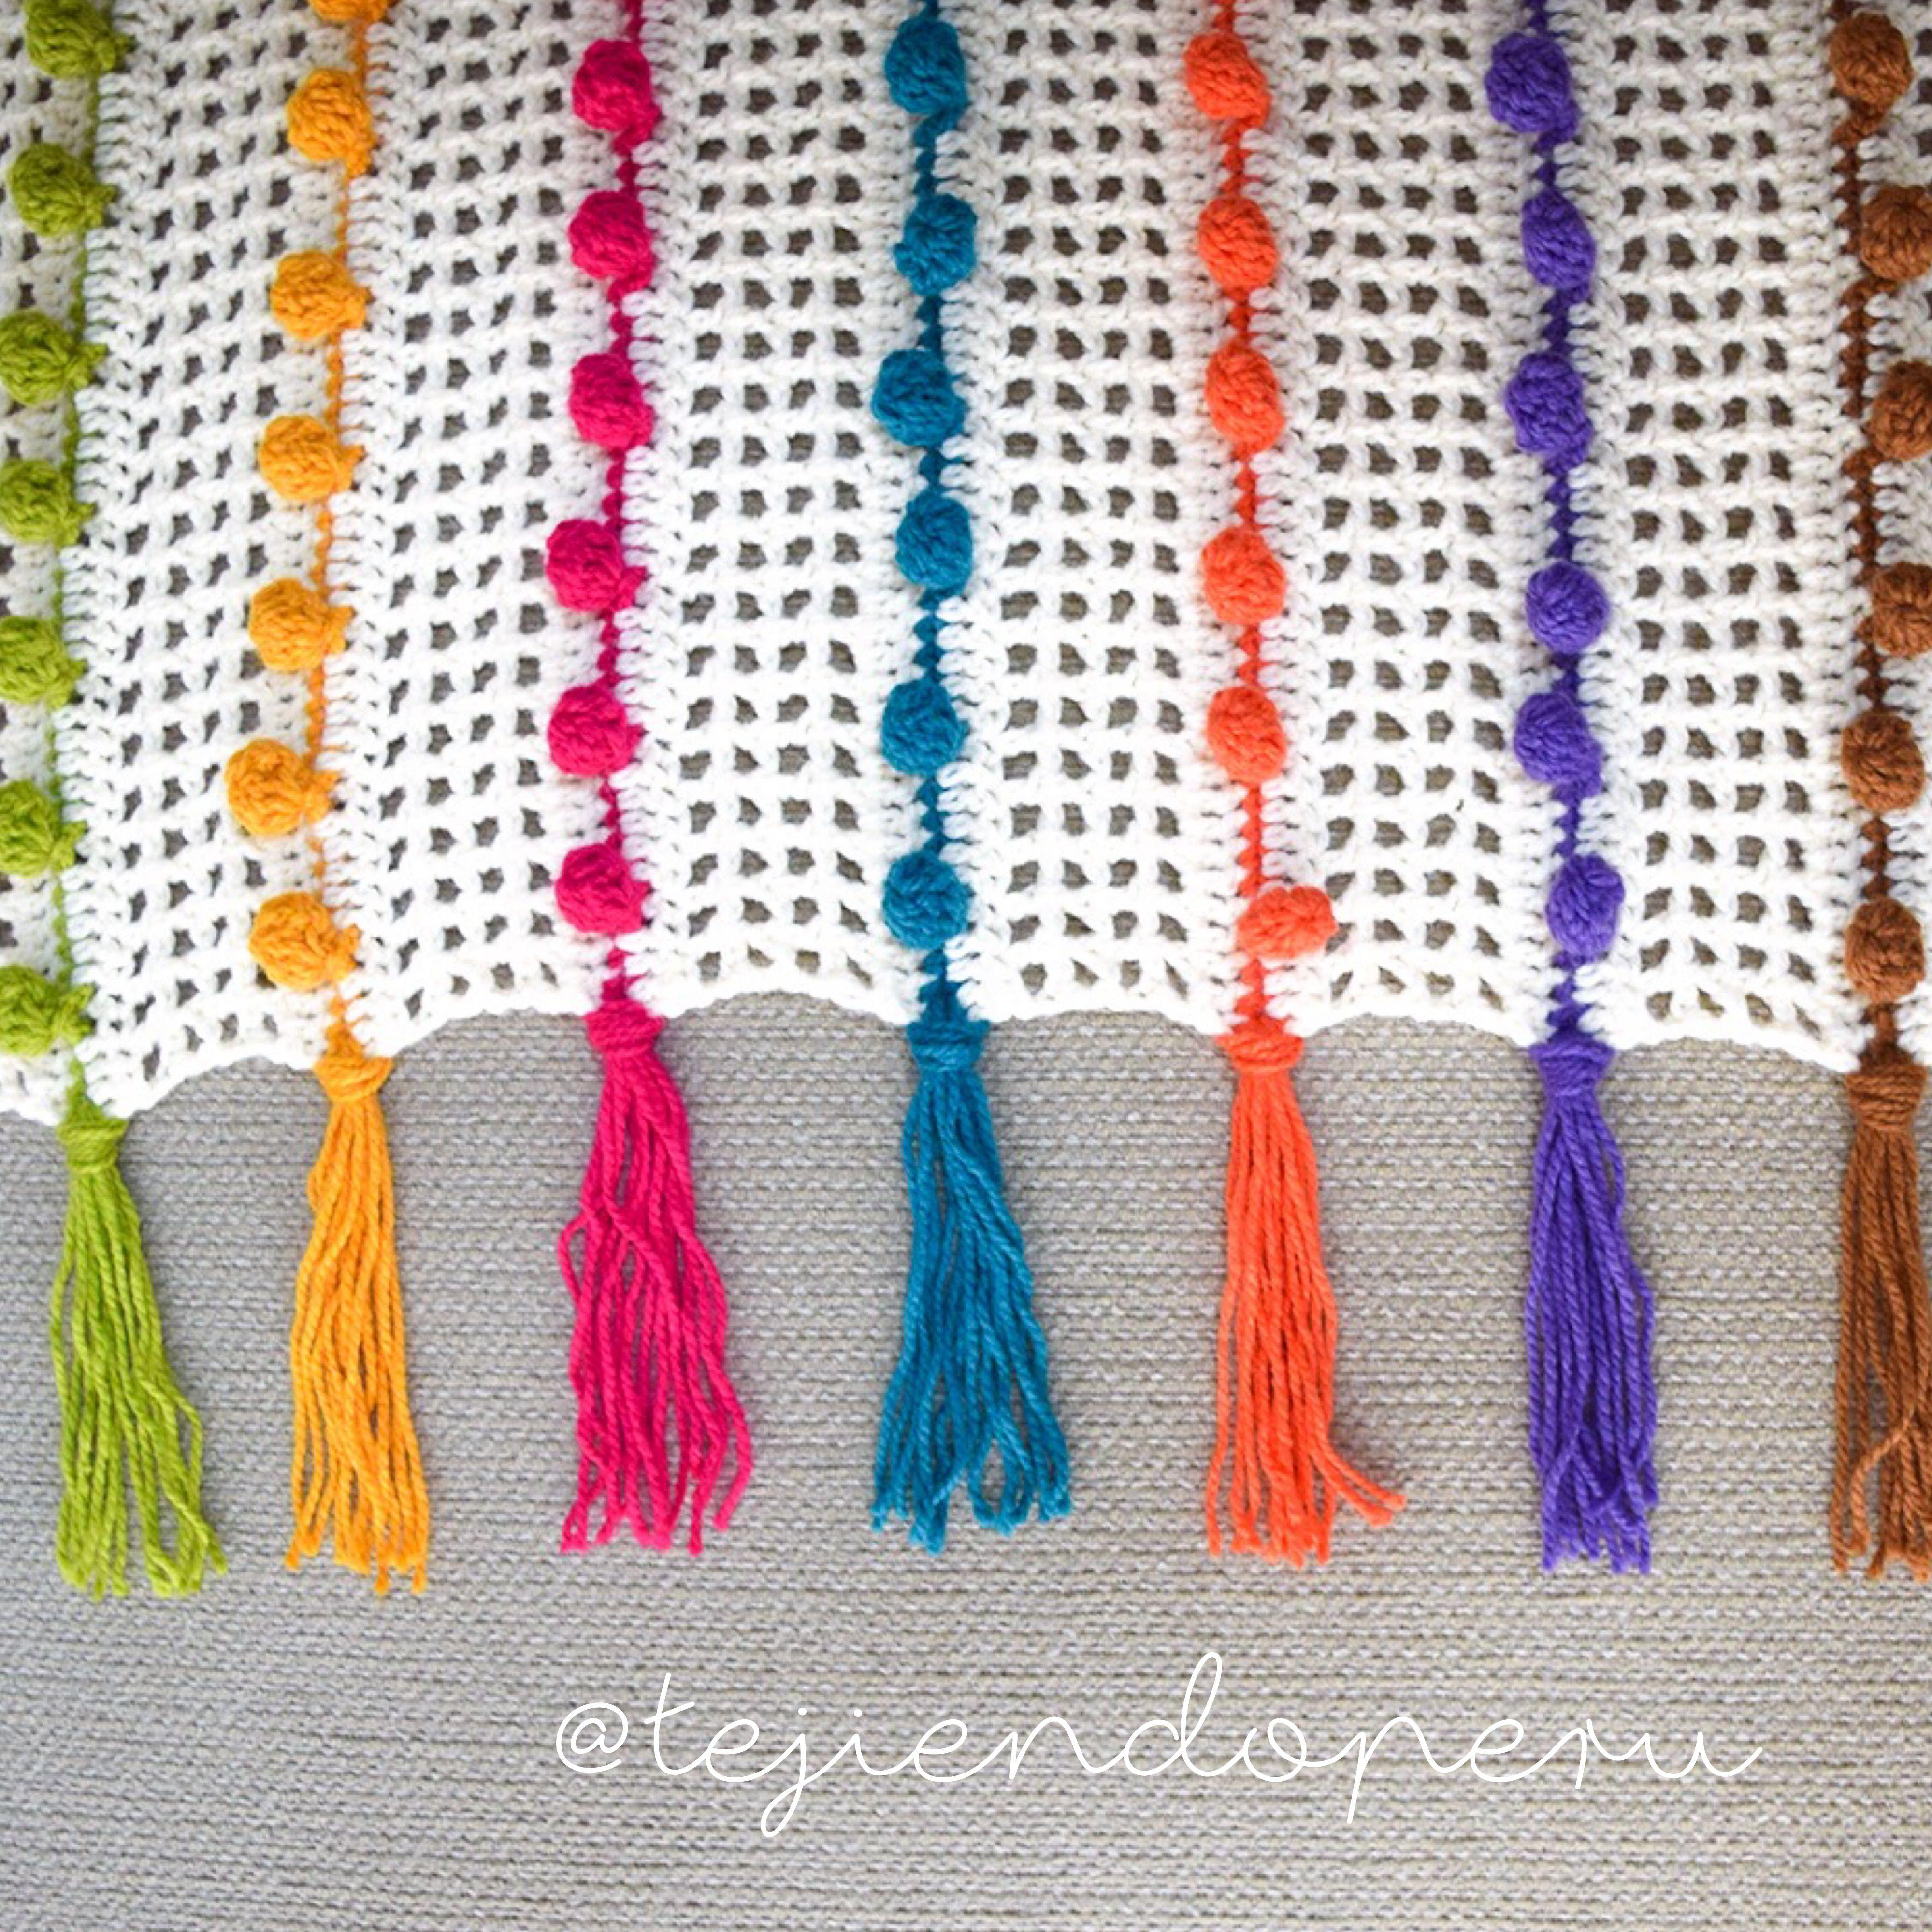 Crochet: colcha tejida en punto pompón (pompom stitch)! Paso a paso ...